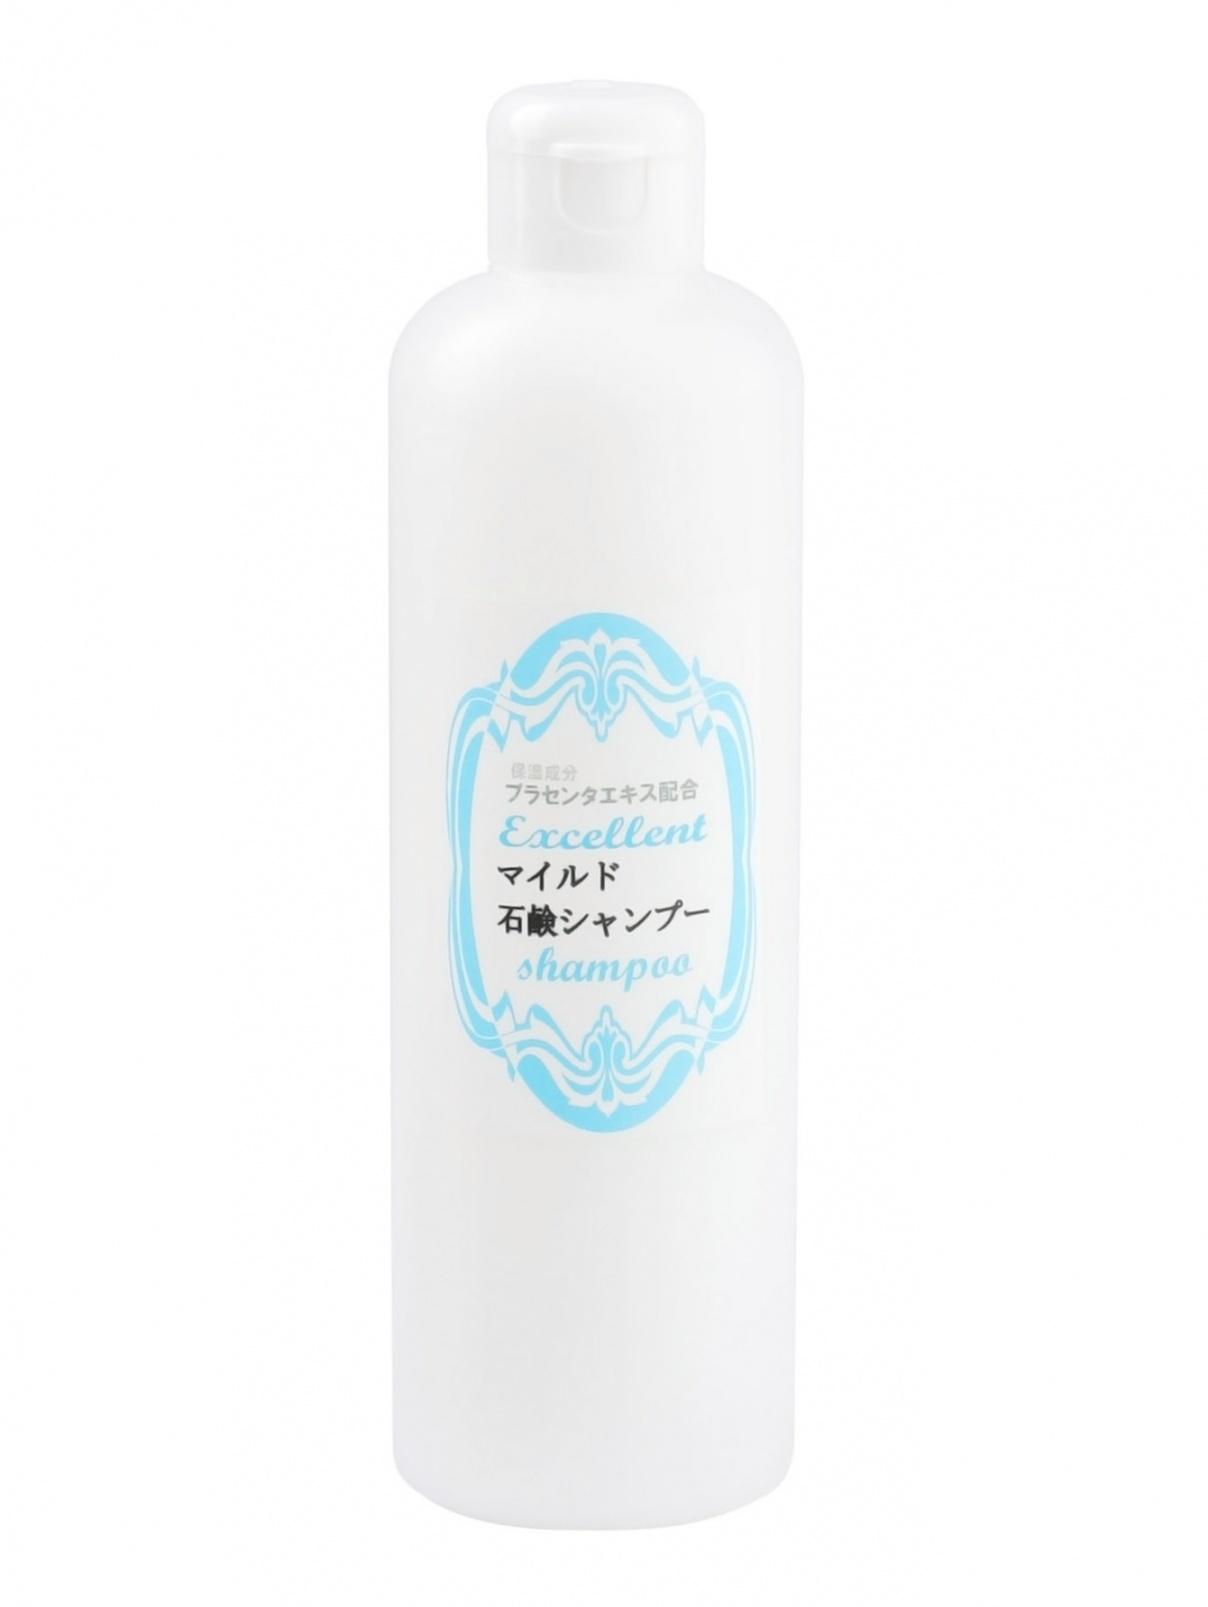 "Плацентарный шампунь - ""Excellent shampoo"", 300ml Jukohbi  –  Общий вид"